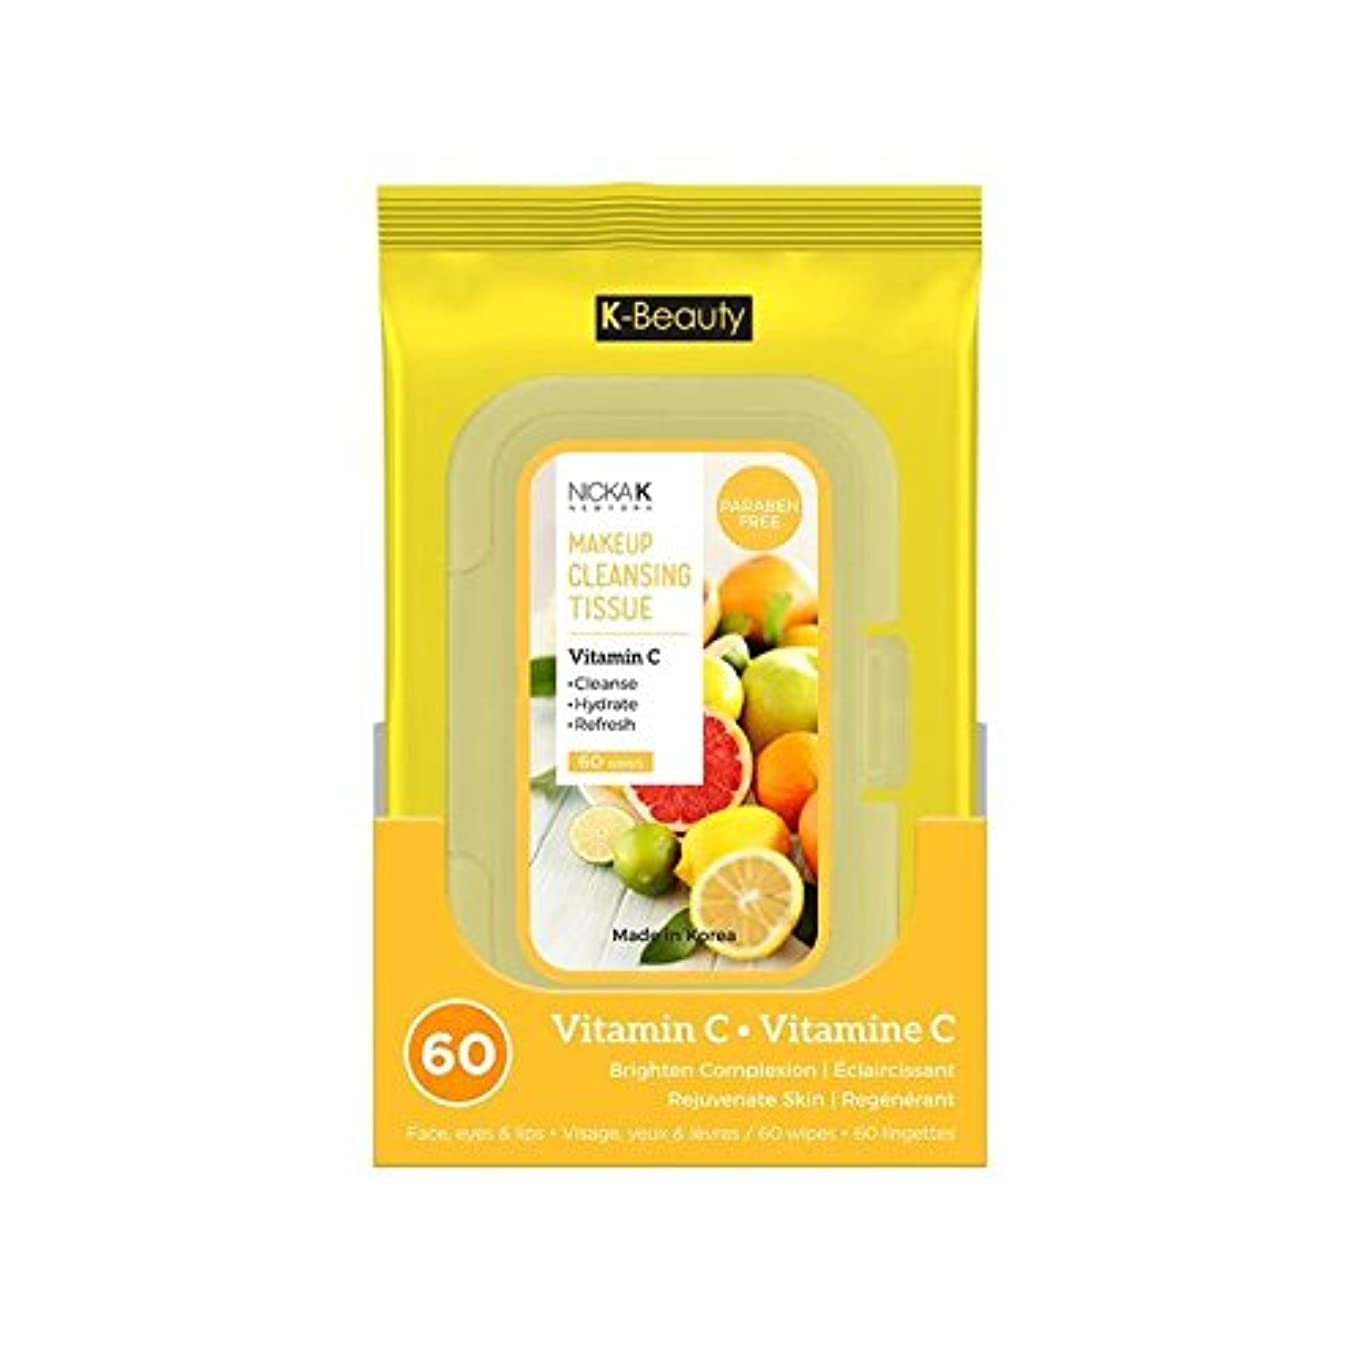 (6 Pack) NICKA K Make Up Cleansing Tissue - Vitamin C (並行輸入品)